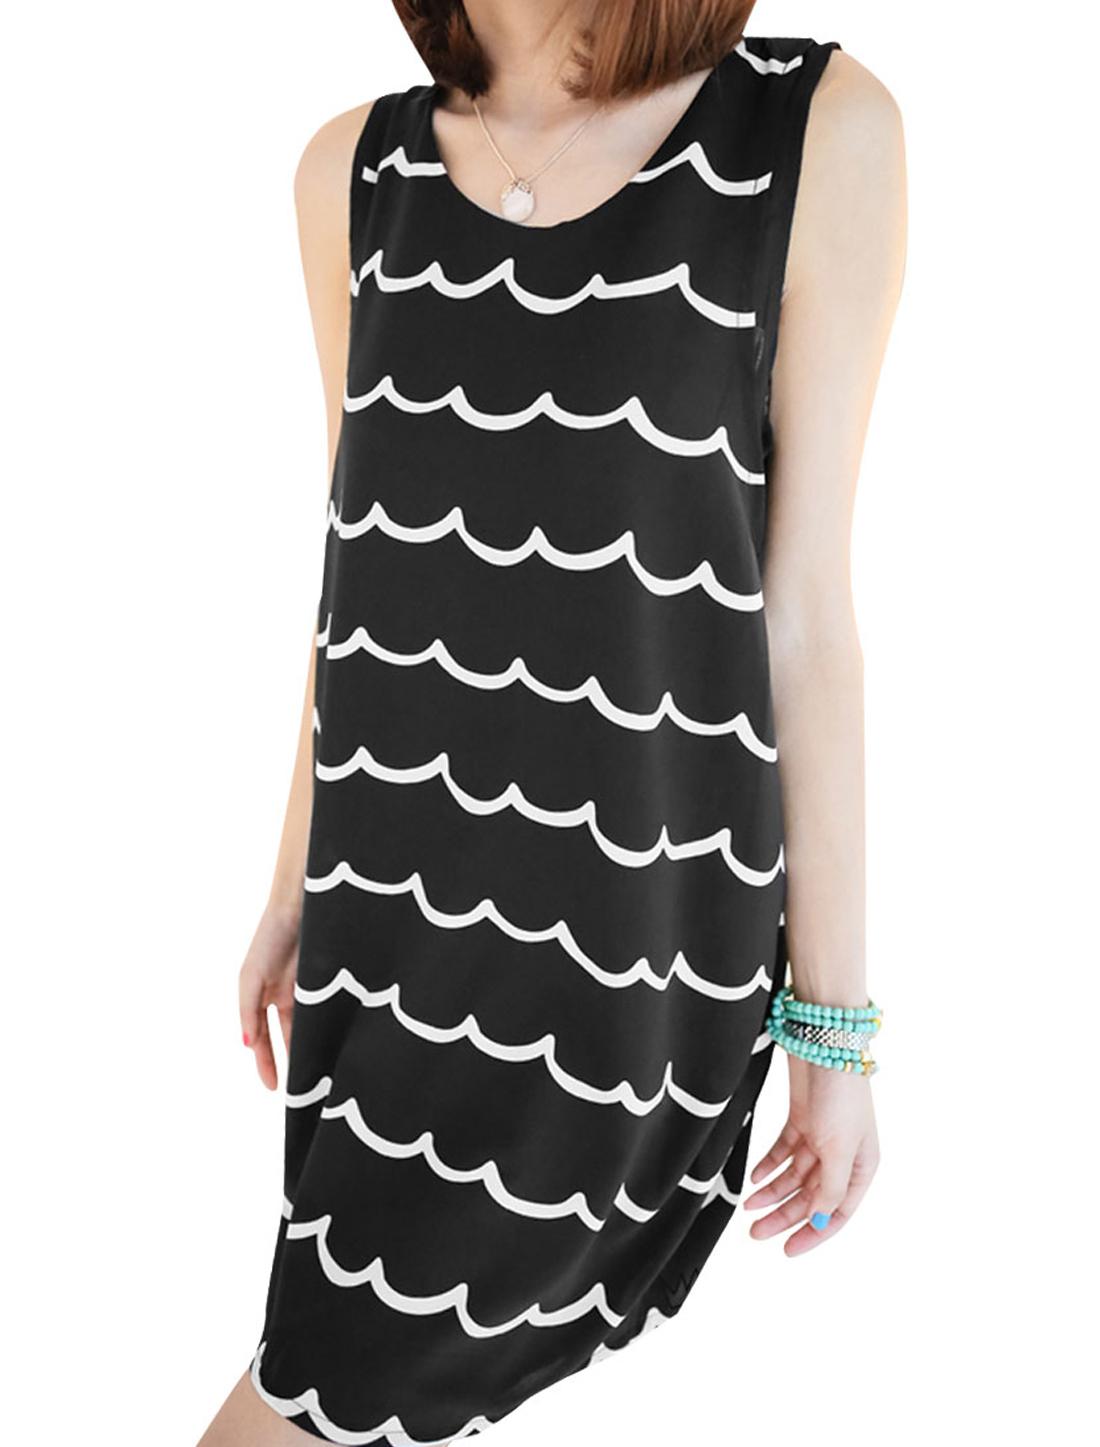 Lady Black Round Neck Sleeveless Layered Design Ripple Style Dress XS